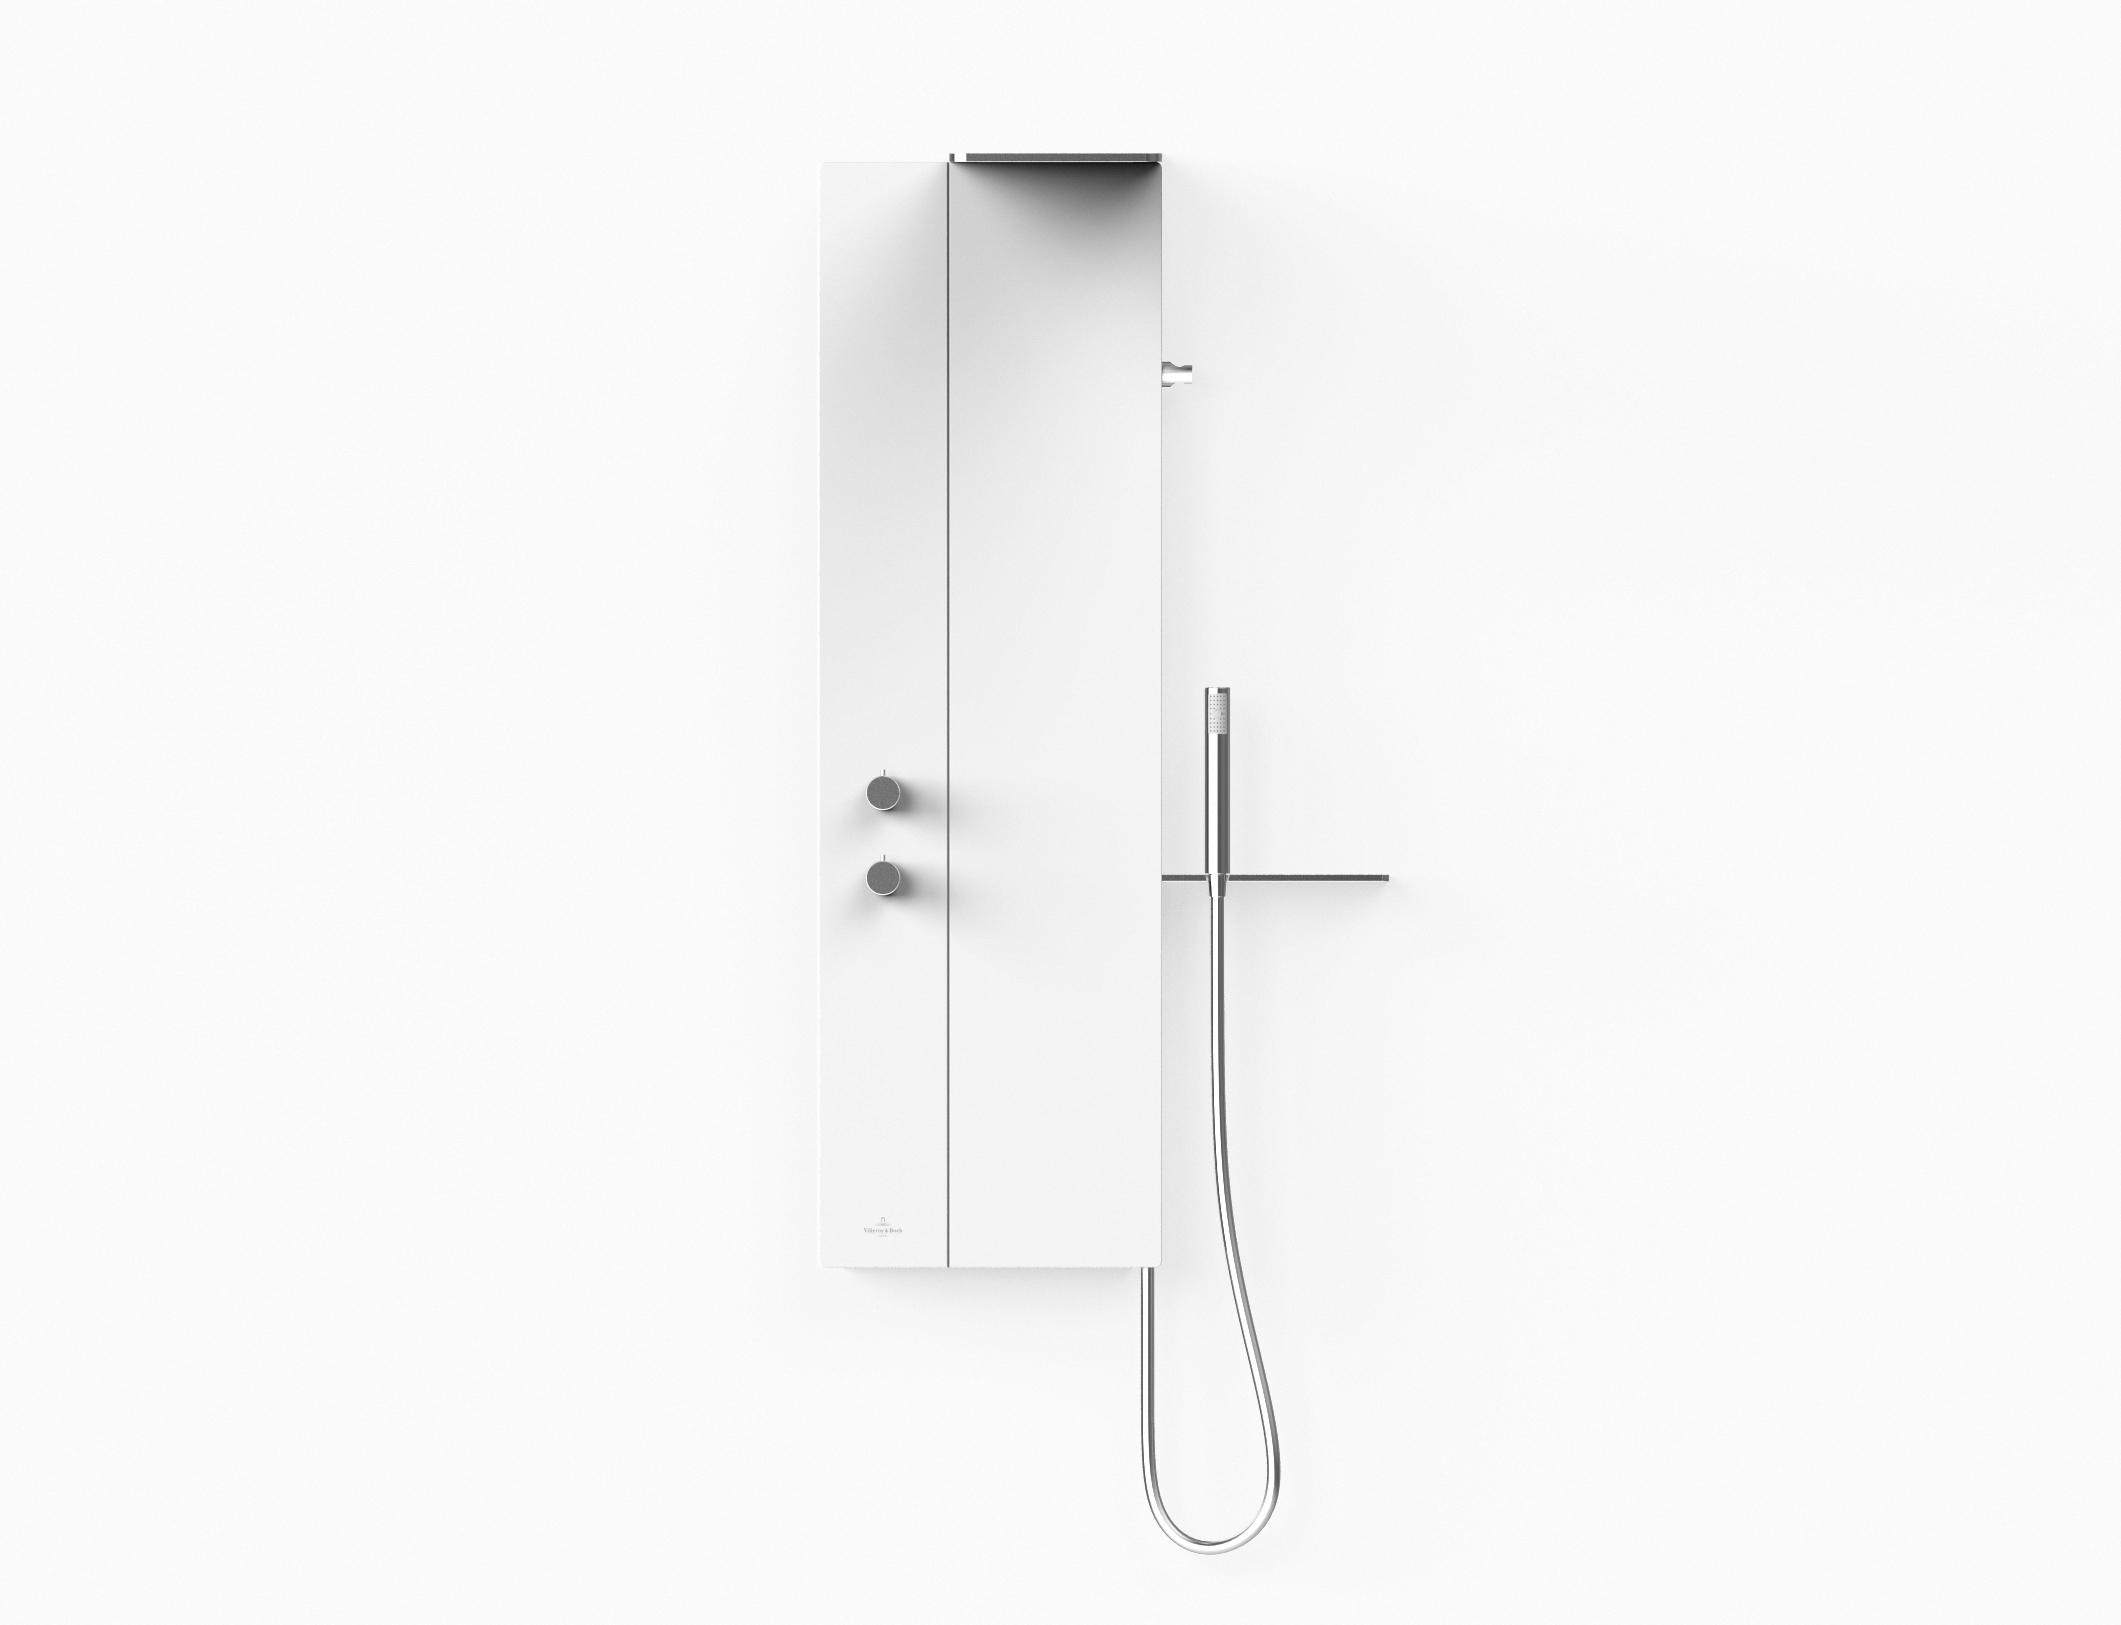 Vivia shower panel by Debiasi Sandri for Villeroy & Boch if award winner